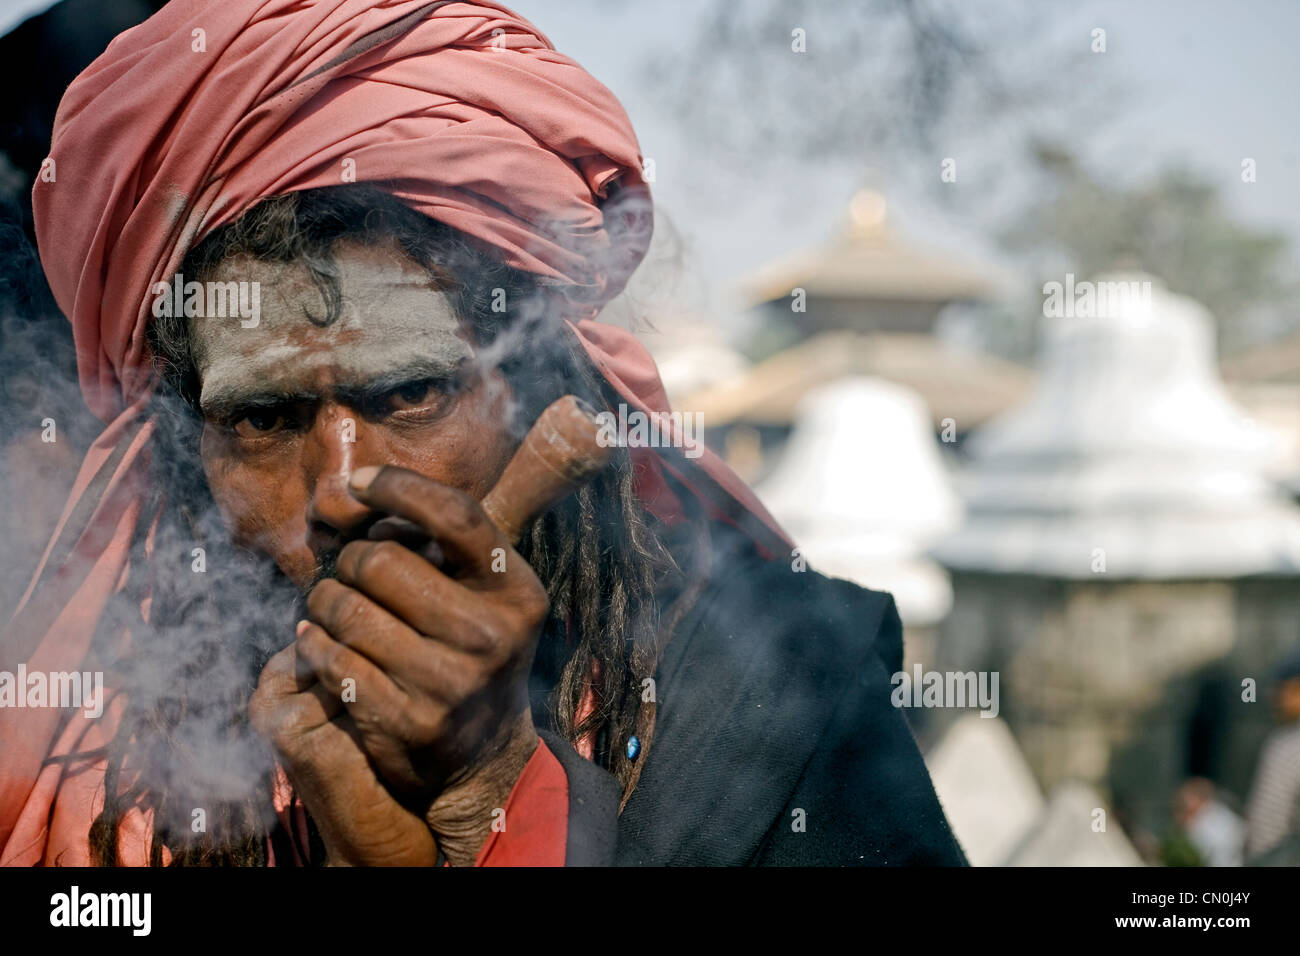 Sadhu smoking chilum (clay pipe ) during Shivaratri festival at Pashupatinath , Kathmandu , Nepal - Stock Image